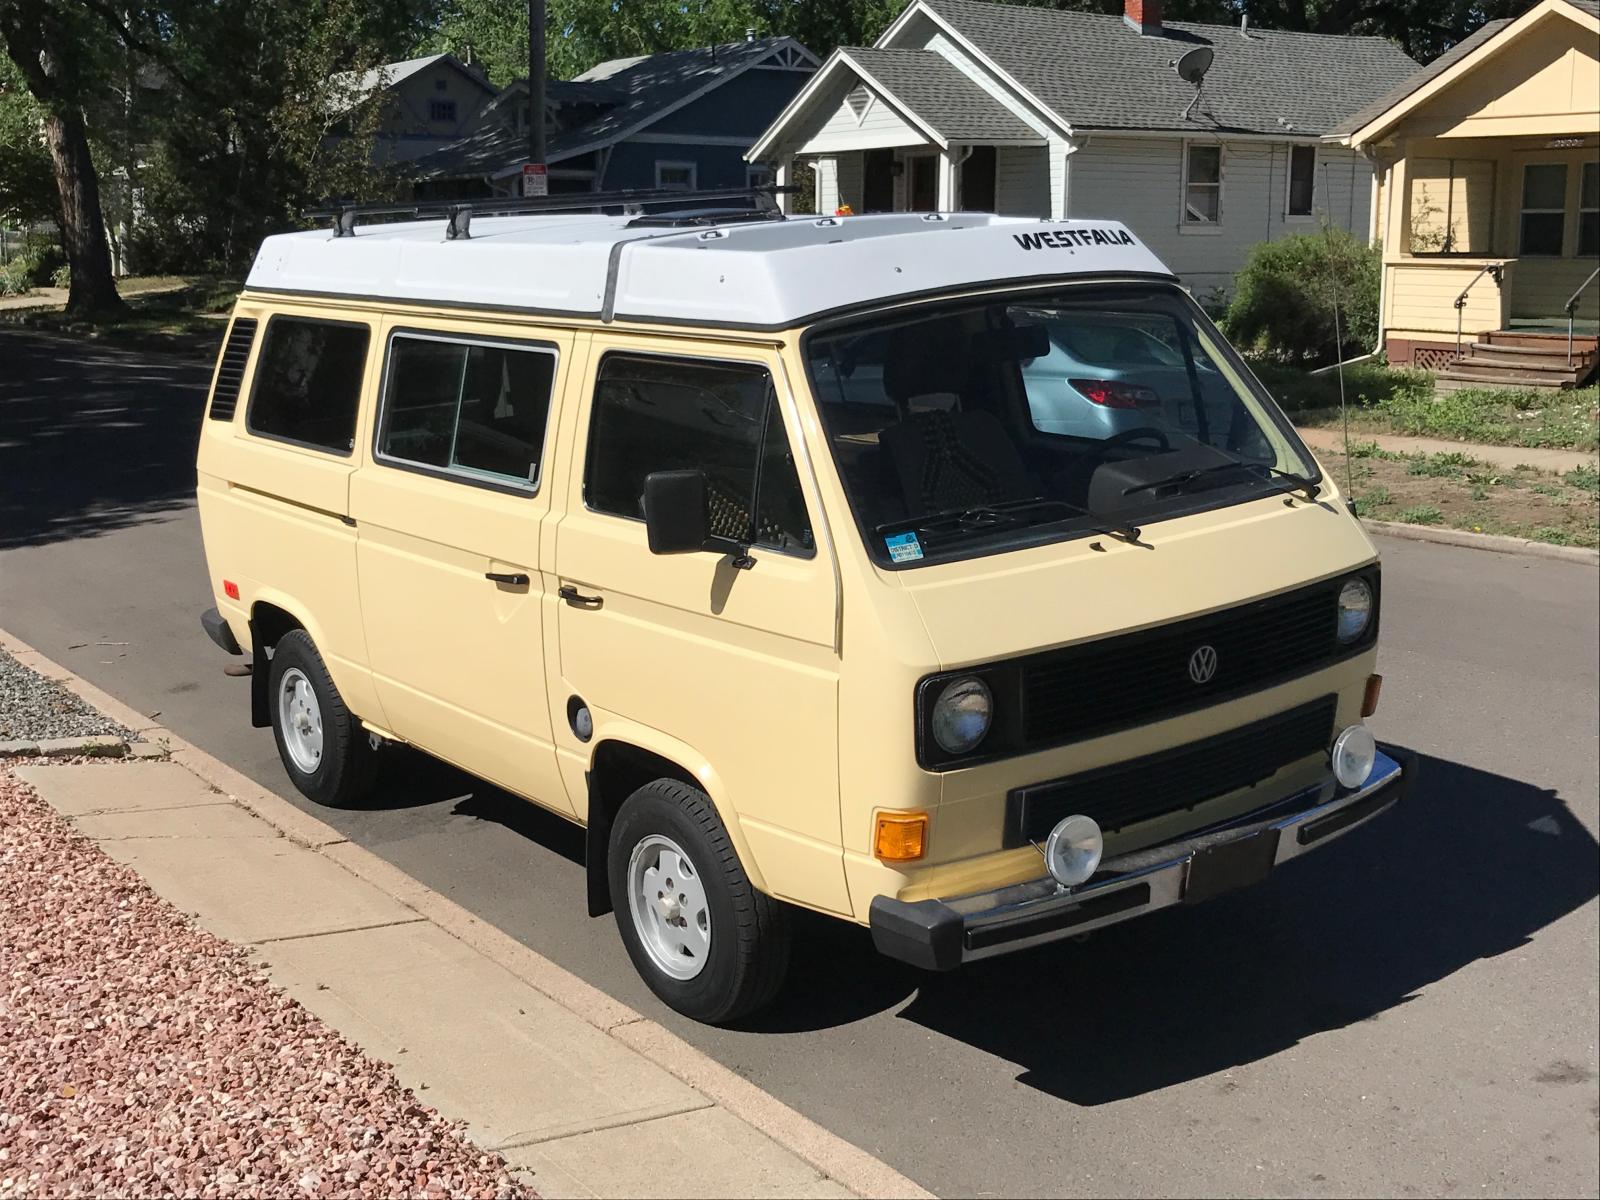 1984 VW Vanagon Westfalia - Denver CO